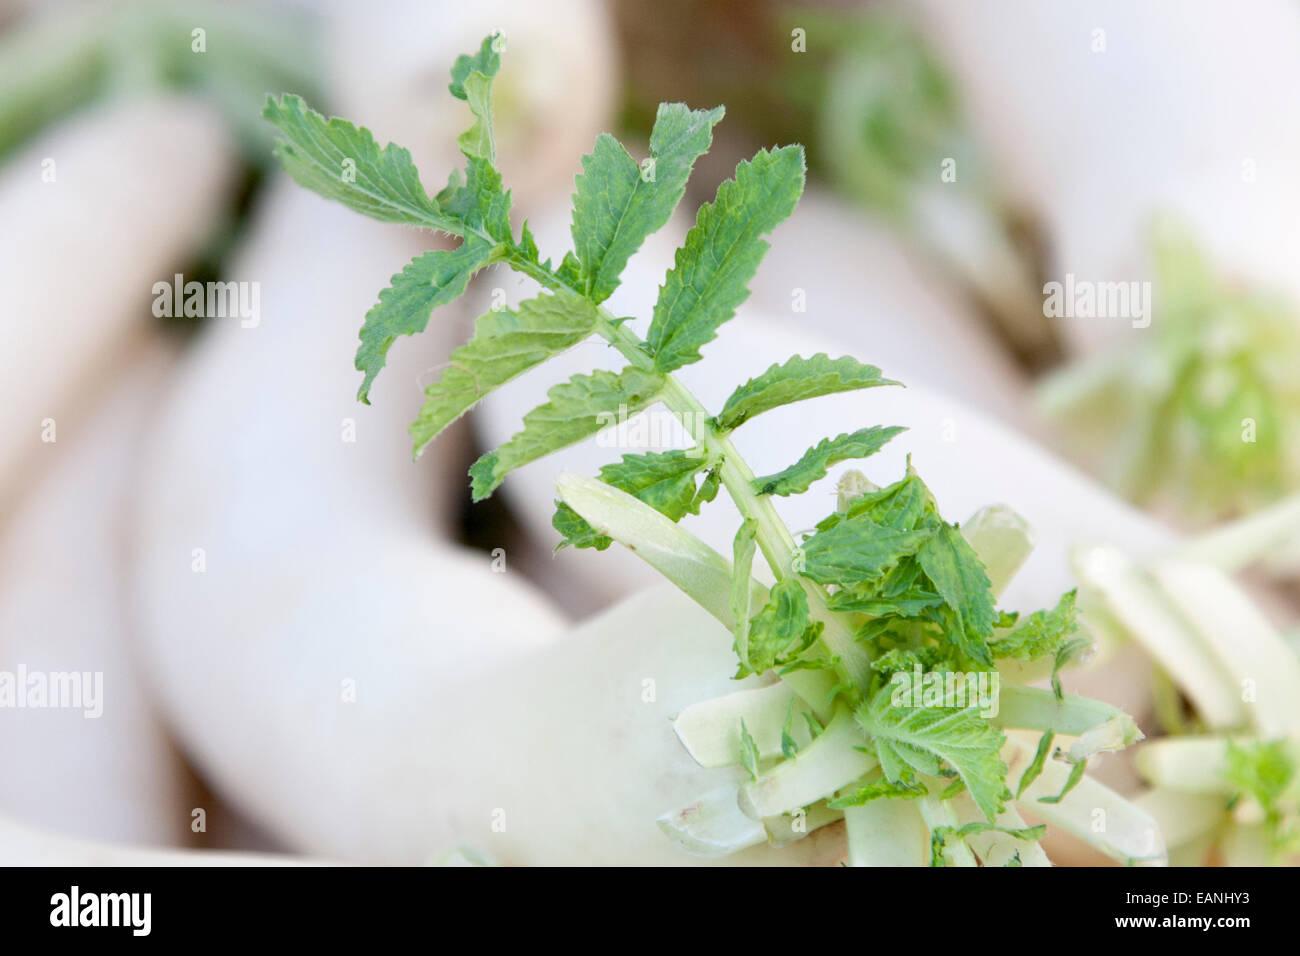 A Daikon leaf at the Berkeley Farmer's Market. - Stock Image